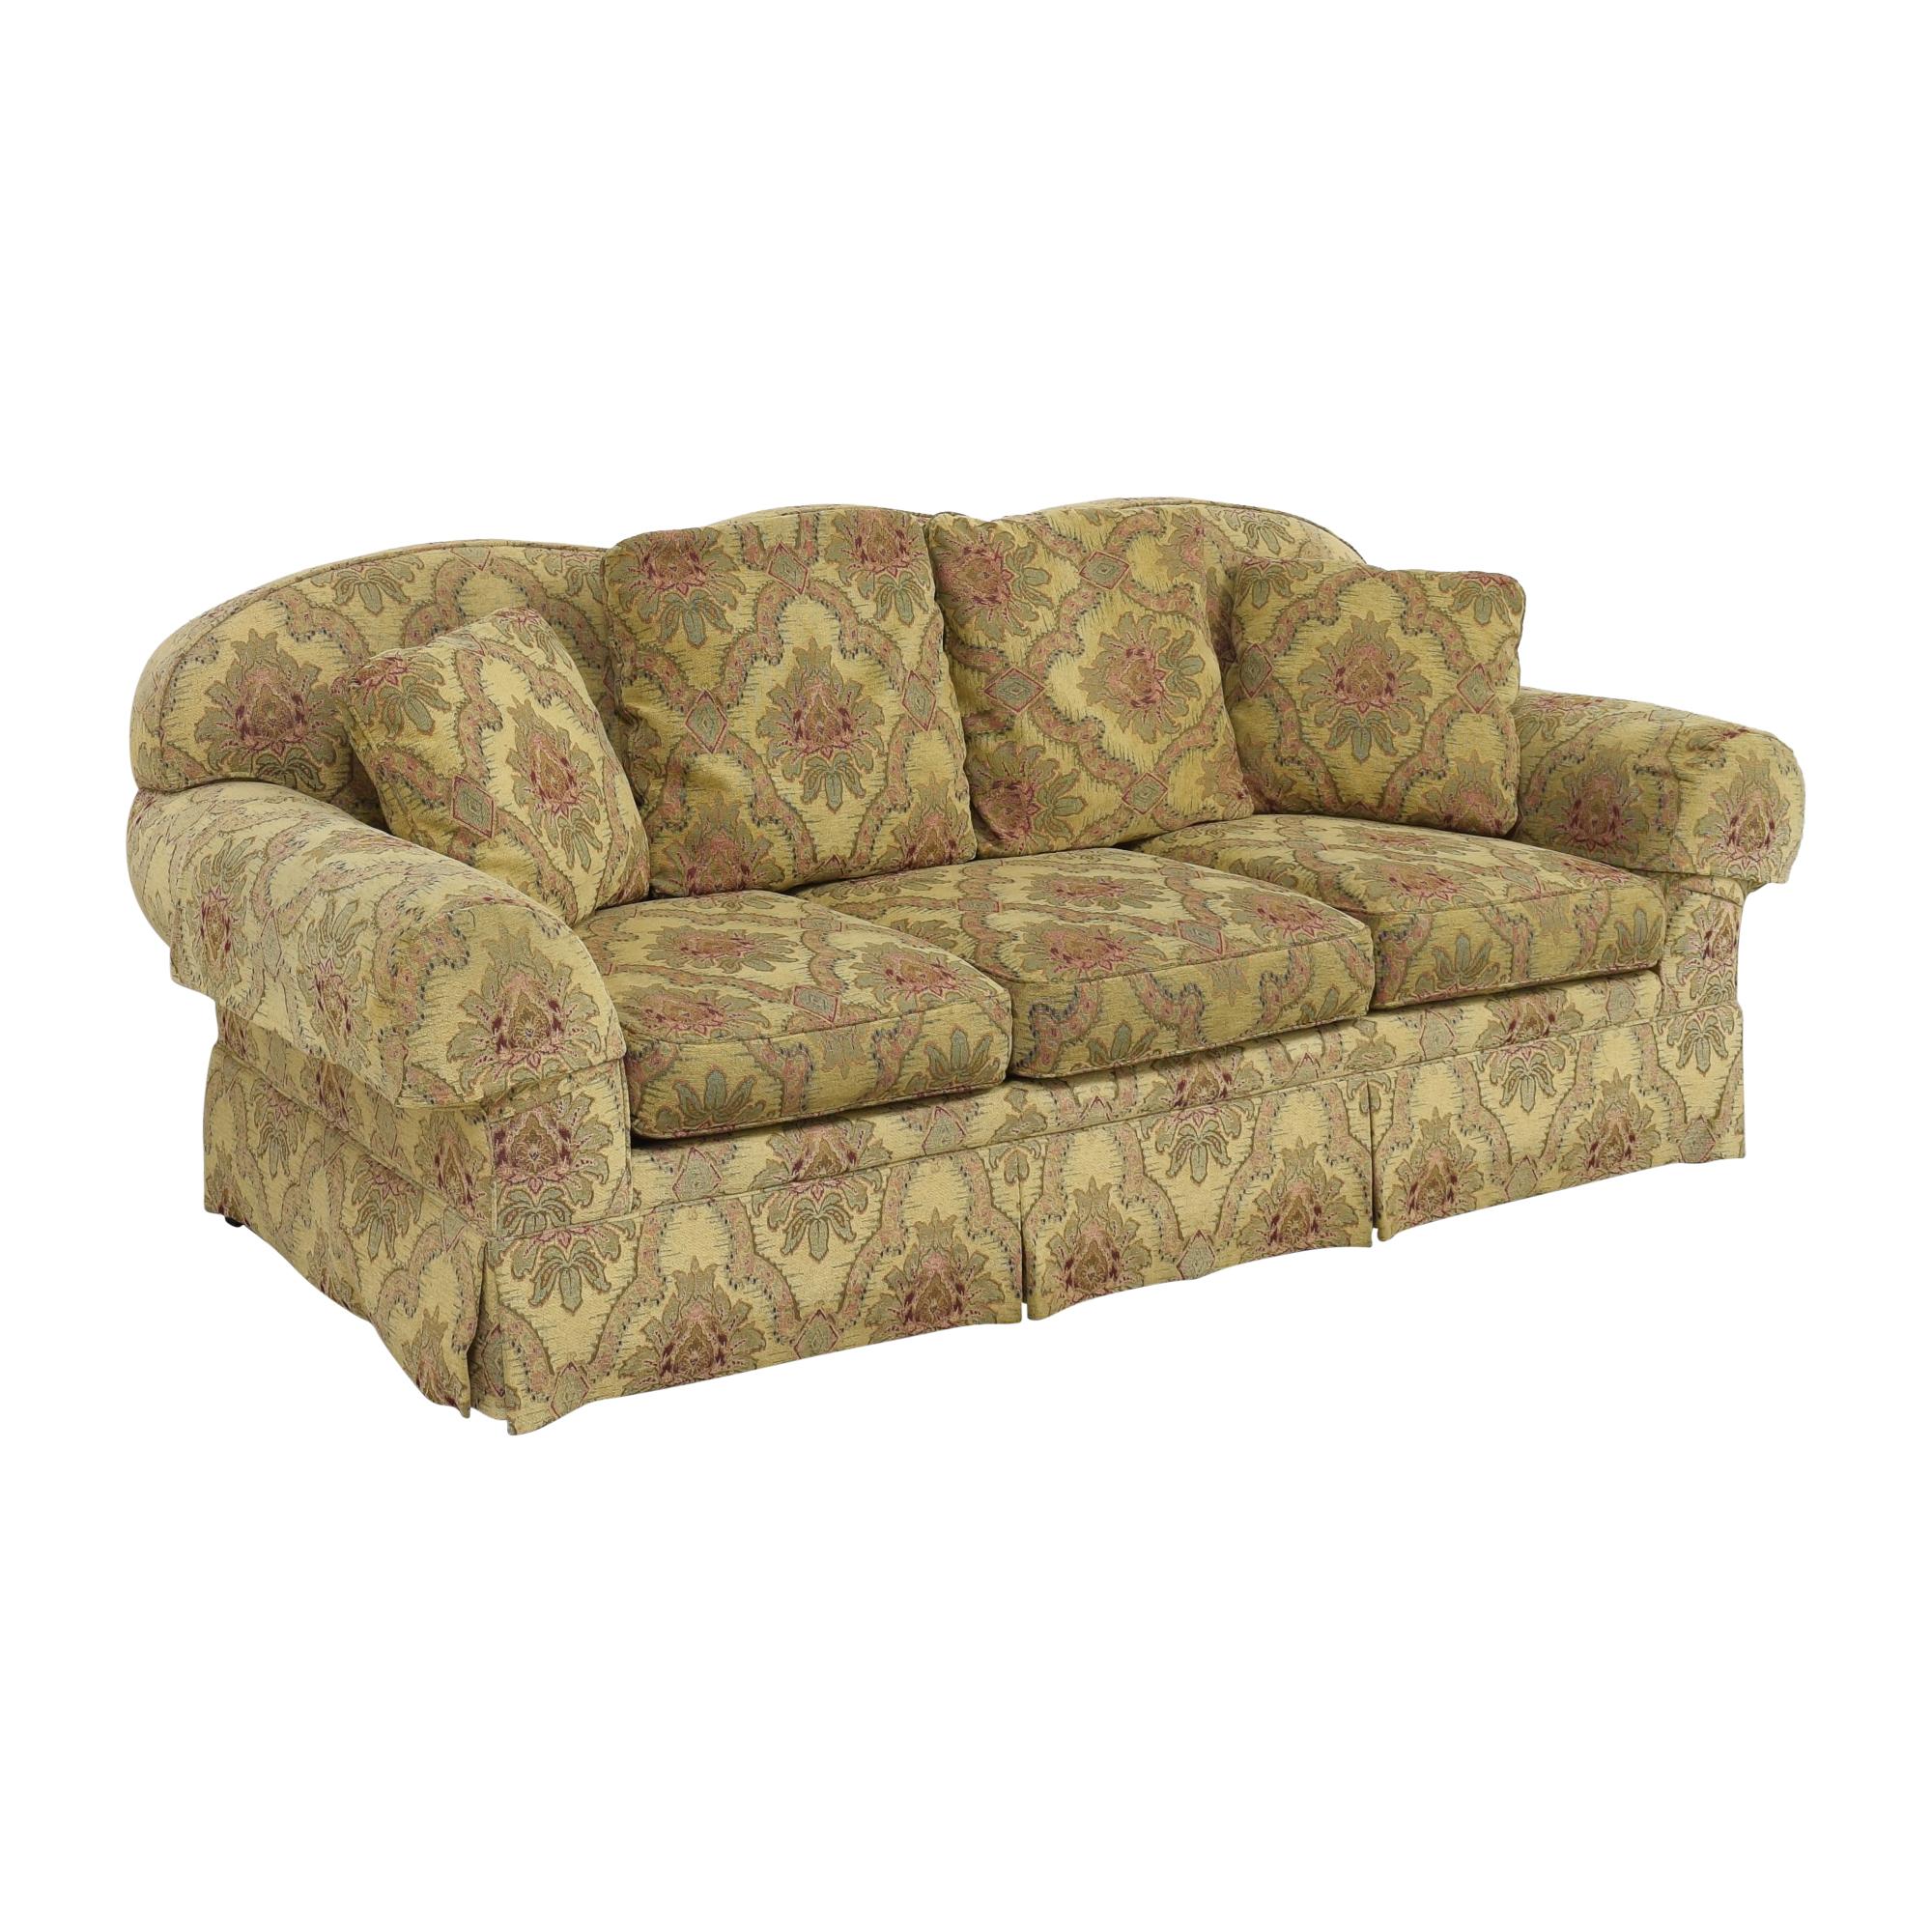 Sherrill Furniture Sherrill Furniture Three Cushion Tapestry Sofa nyc